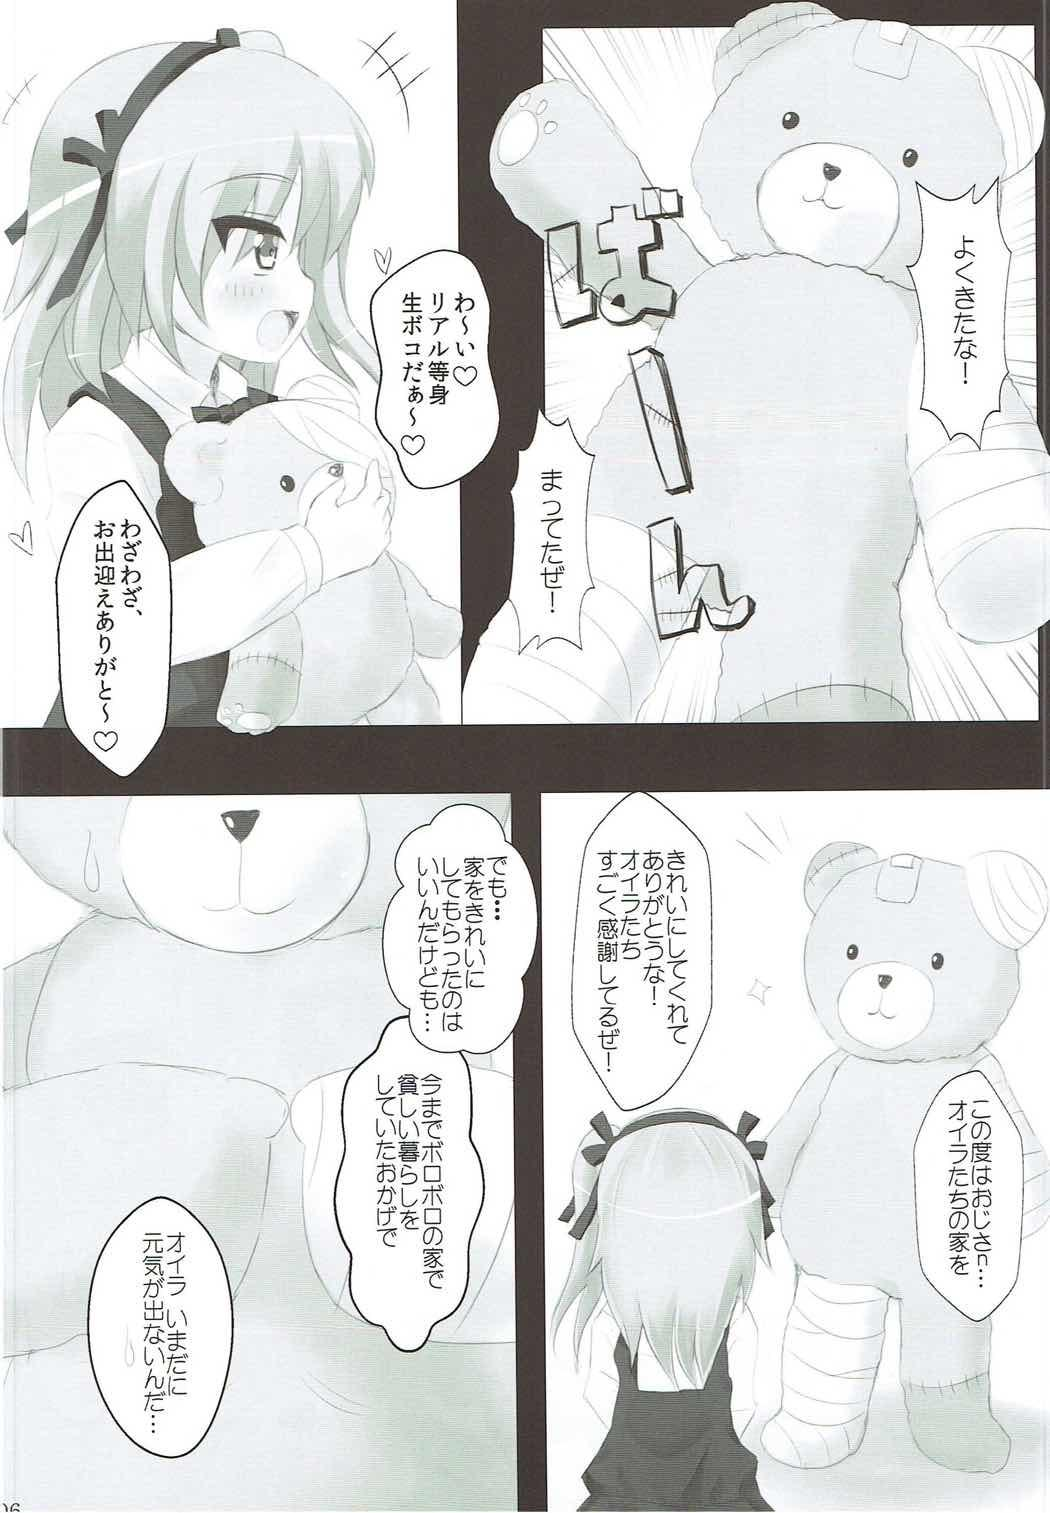 Arisu-chan to Kigurumi Sex 4